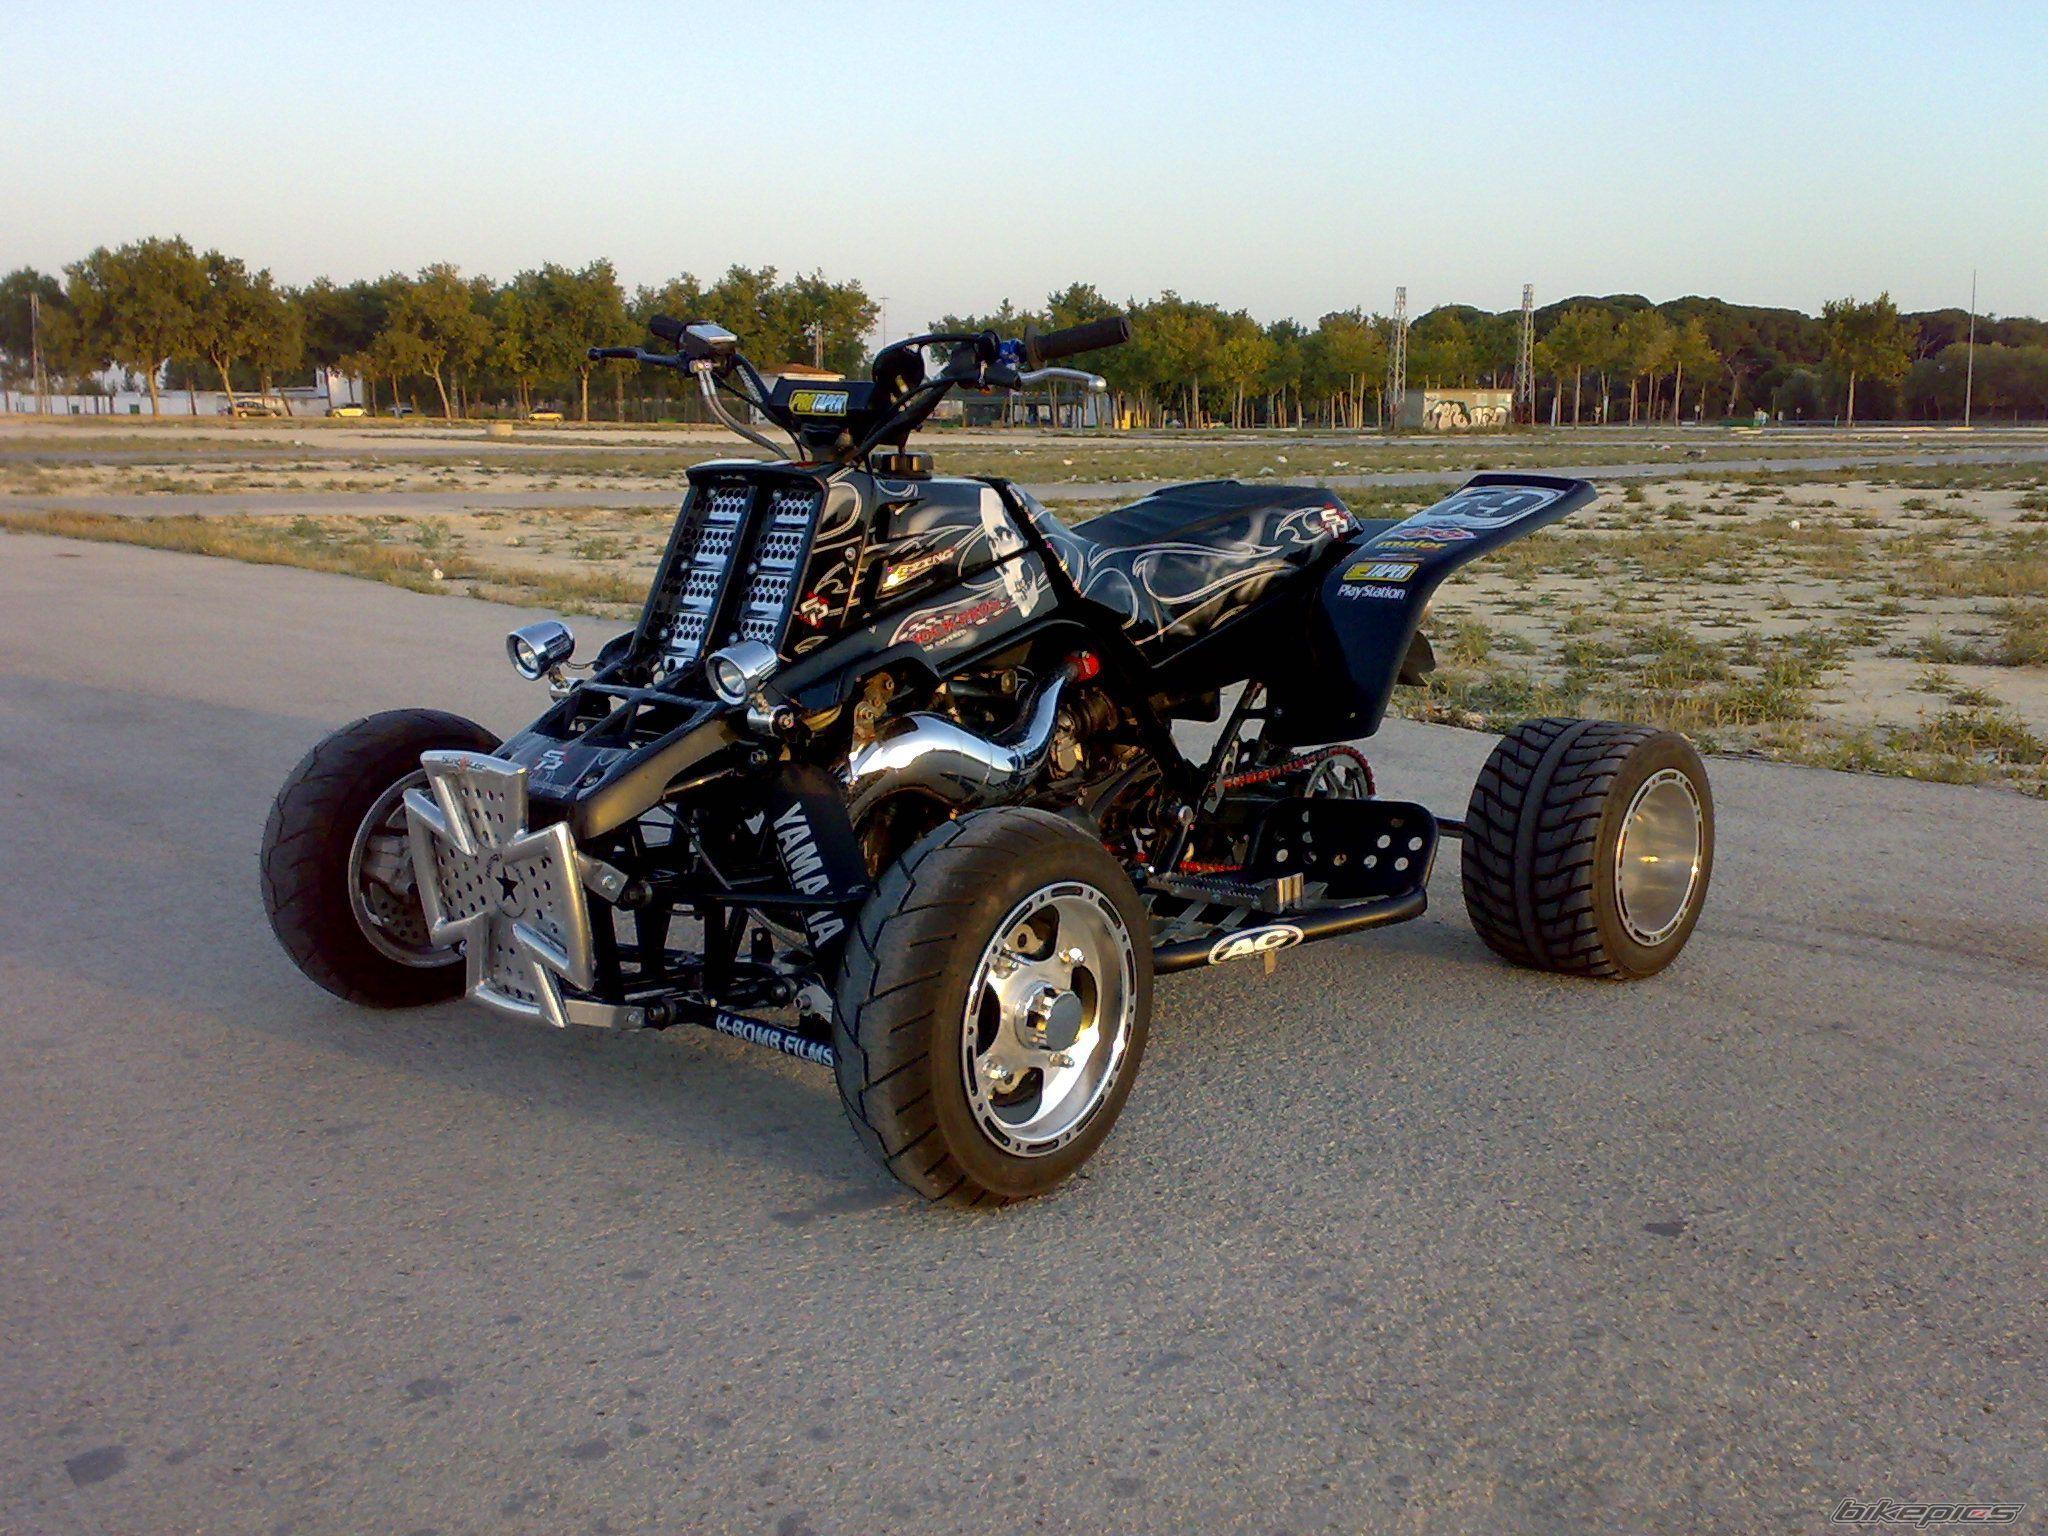 Yamaha Banshee Atv Quad Offroad Motorbike Bike Dirtbike Hot Rod